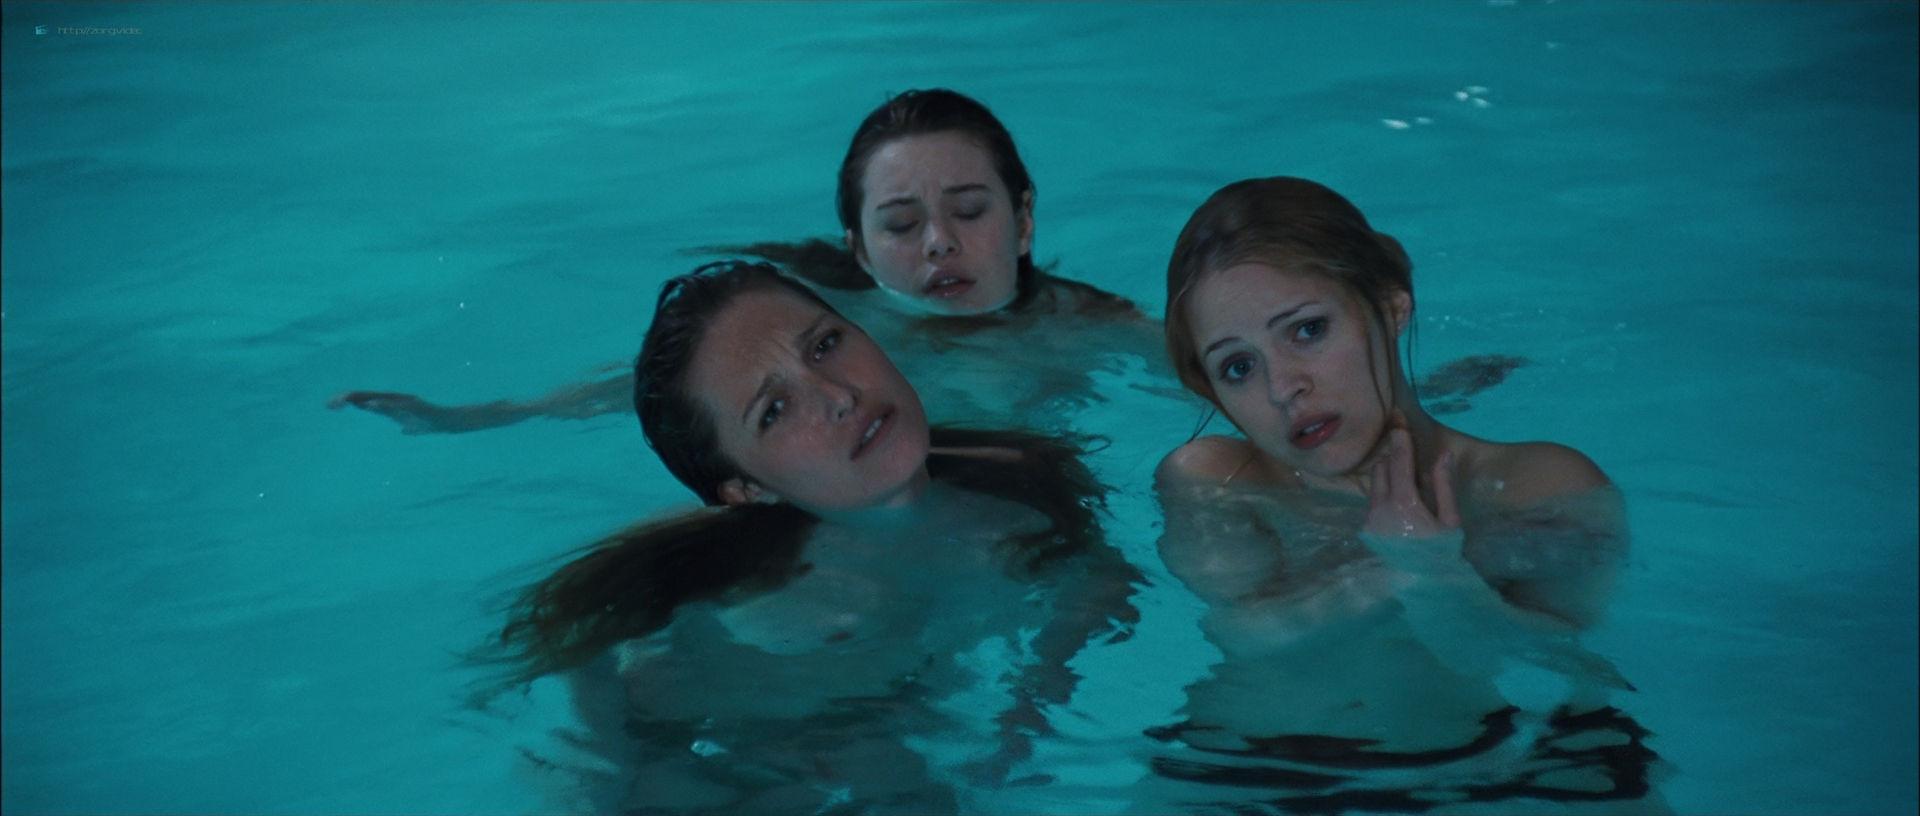 Camille Rowe nude and Josephine de La Baume nude sex threesome - Notre jour viendra (FR-2010) HD 1080p BluRay (16)